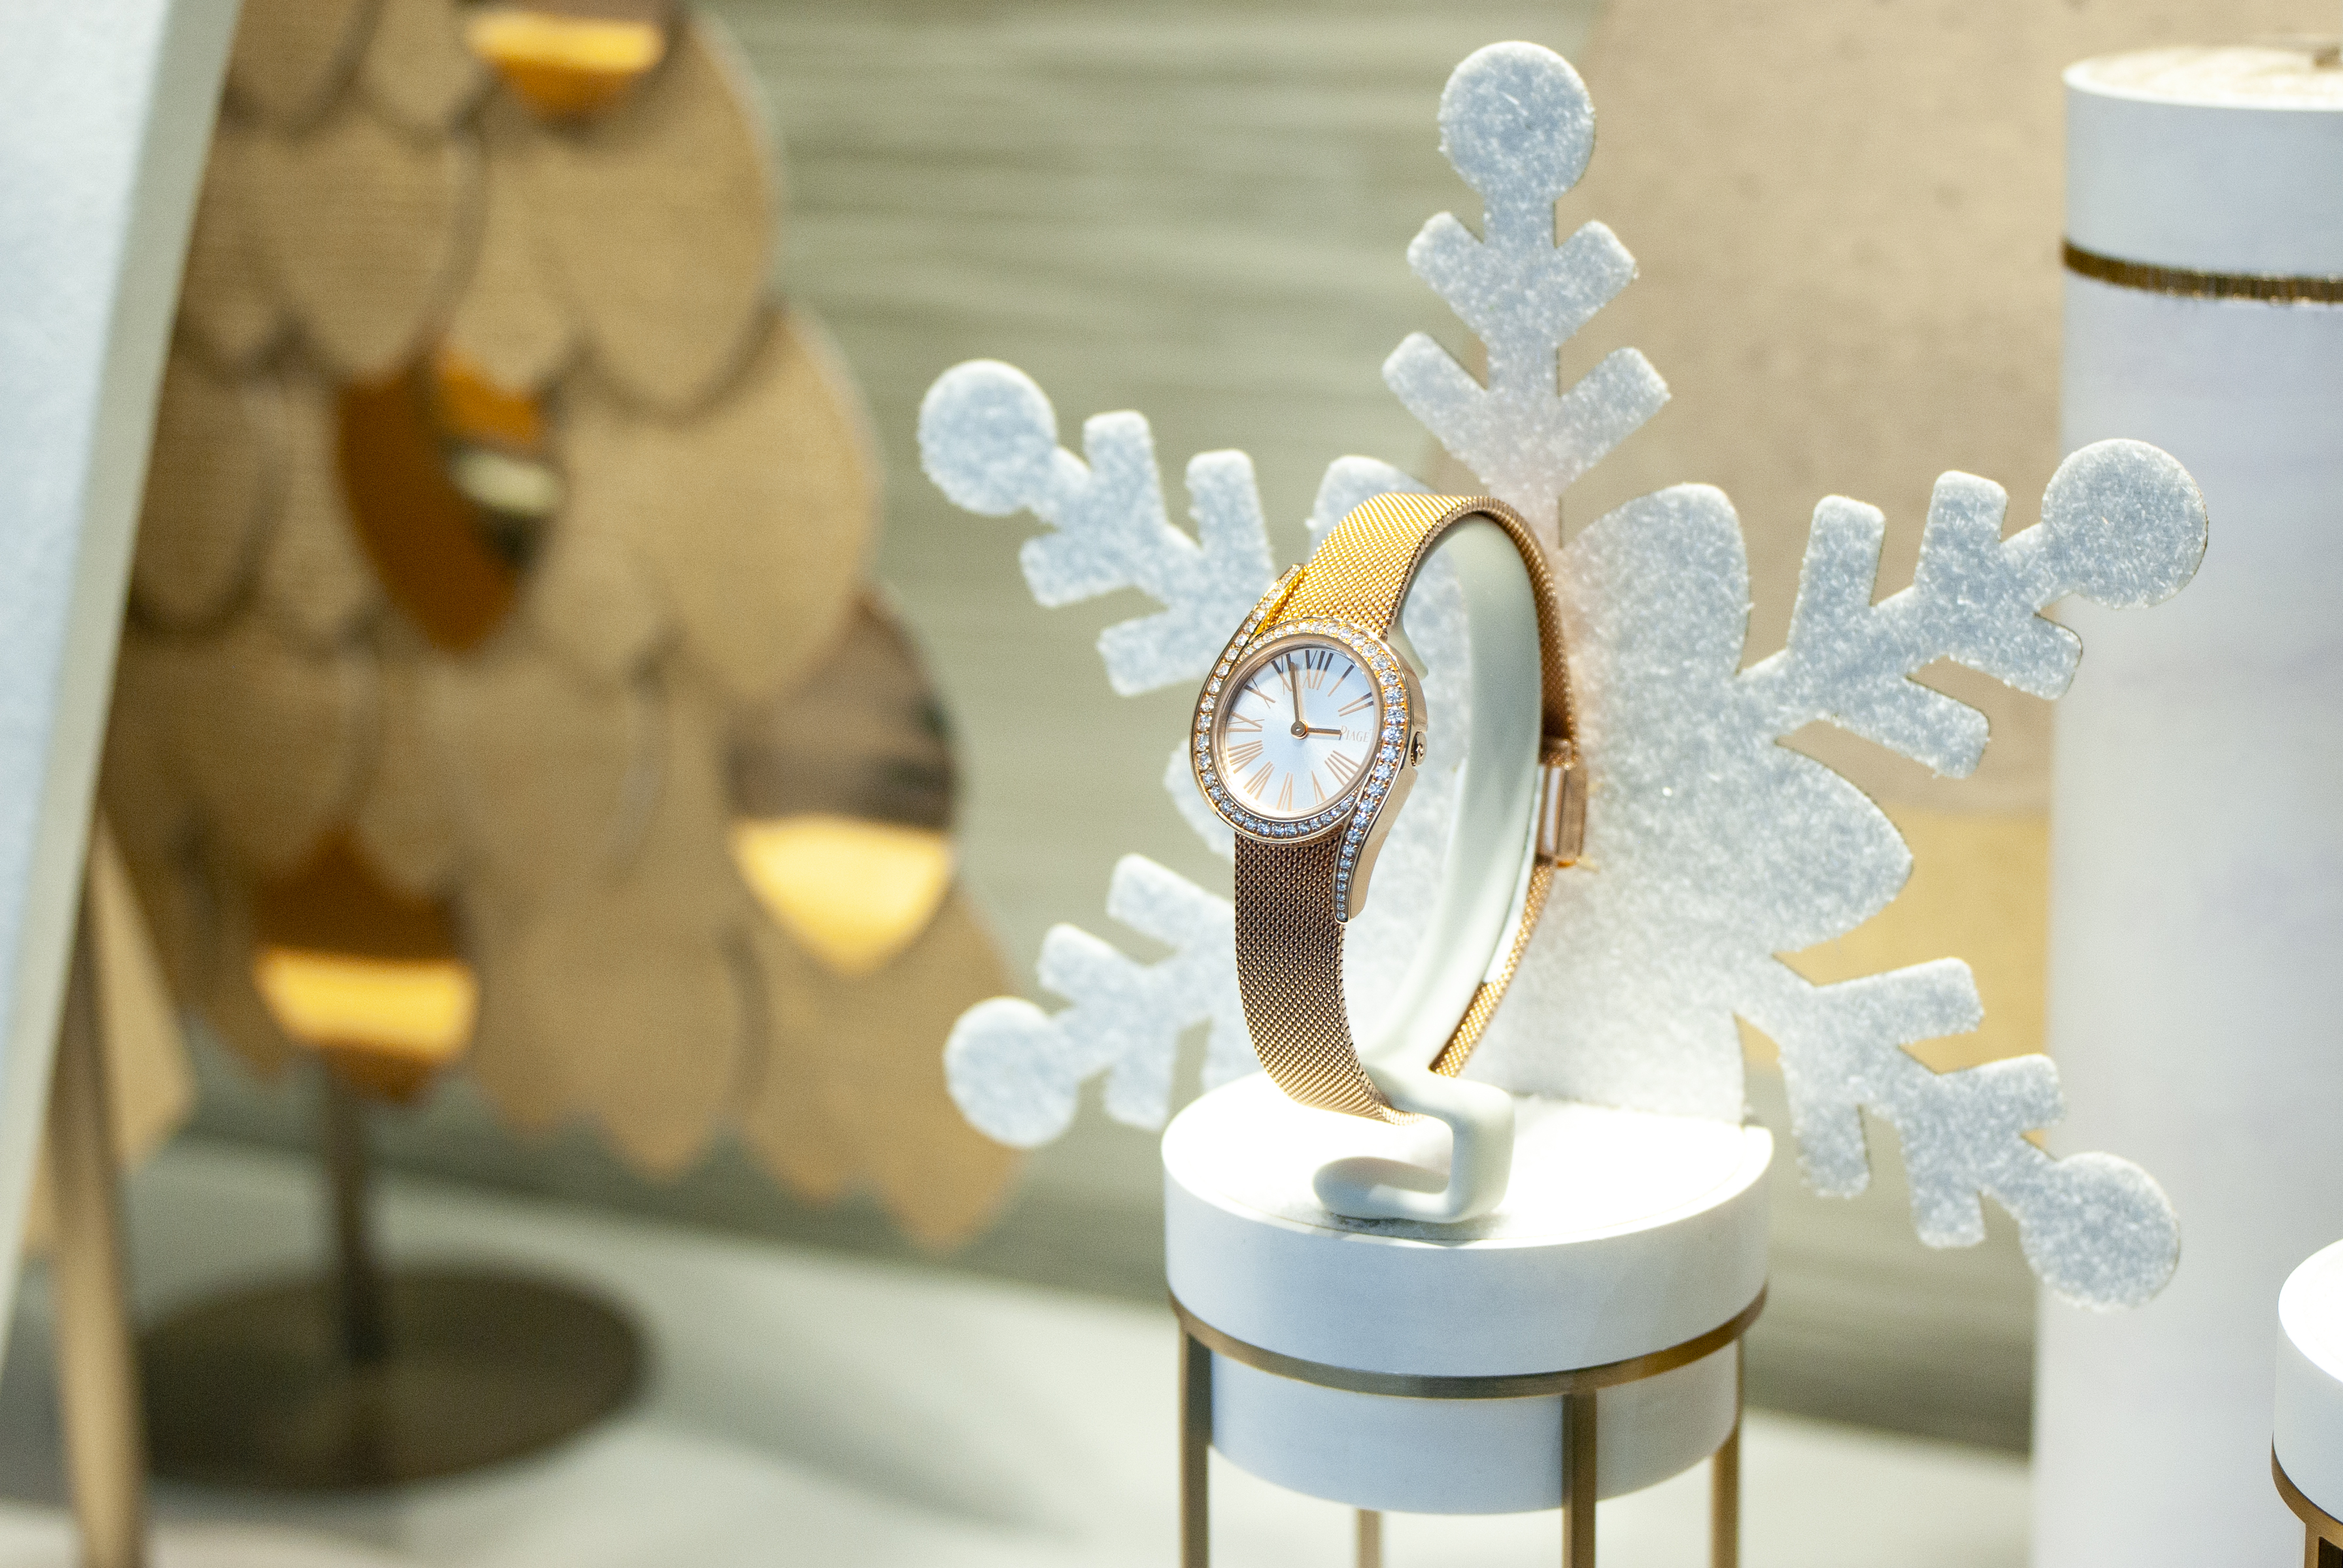 Vitrine décors Agence retail design visual merchandising luxe